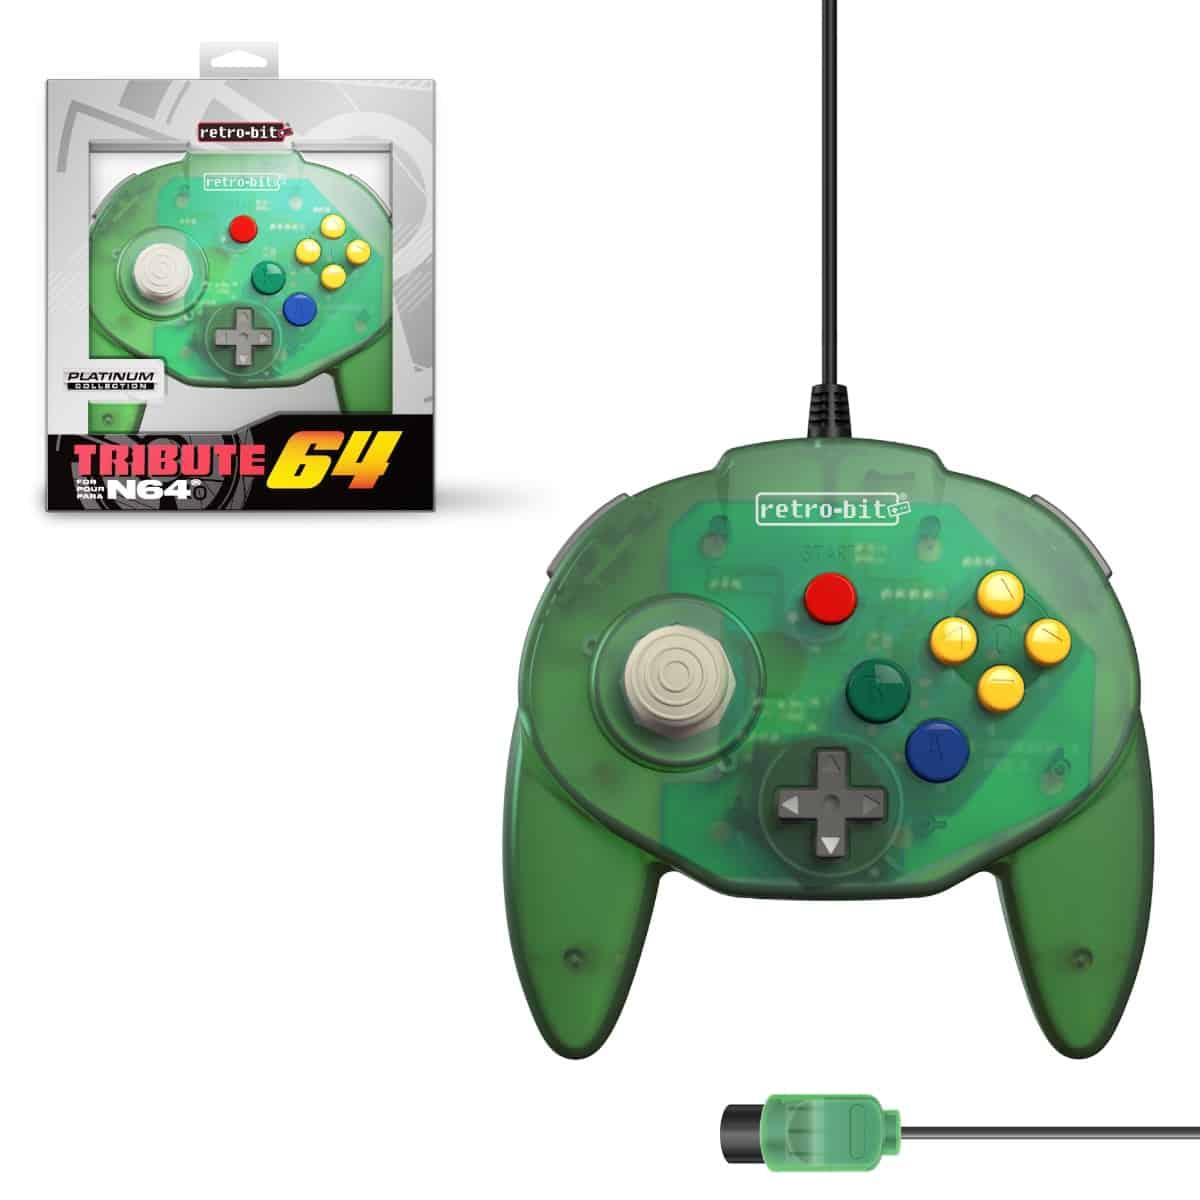 Retro-Bit Tribute 64 Forest Green Nintendo 64 Controller